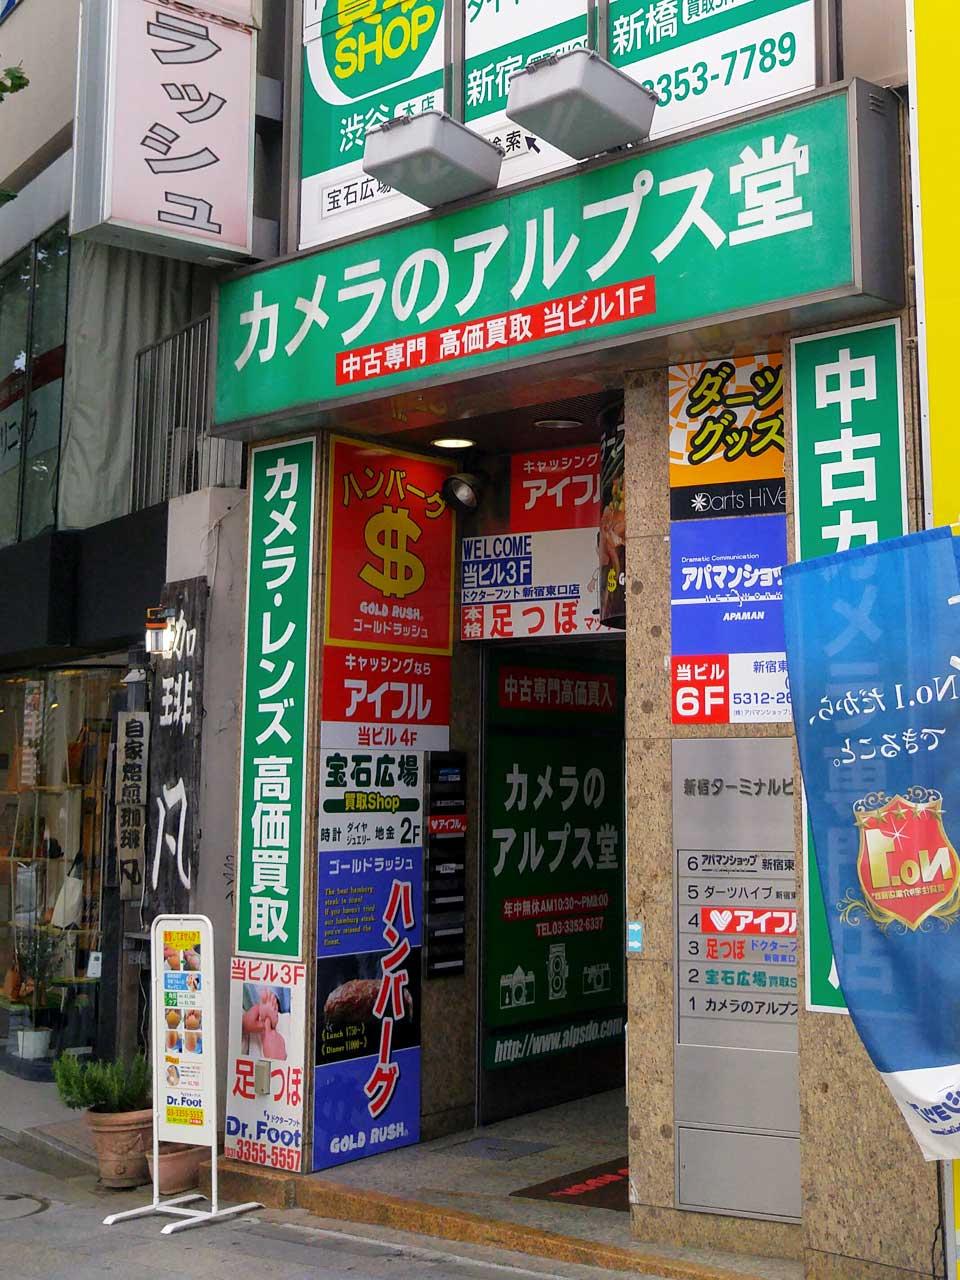 Camera no Arupusu storefront - Used camera store in Shinjuku, Tokyo - EYExplore